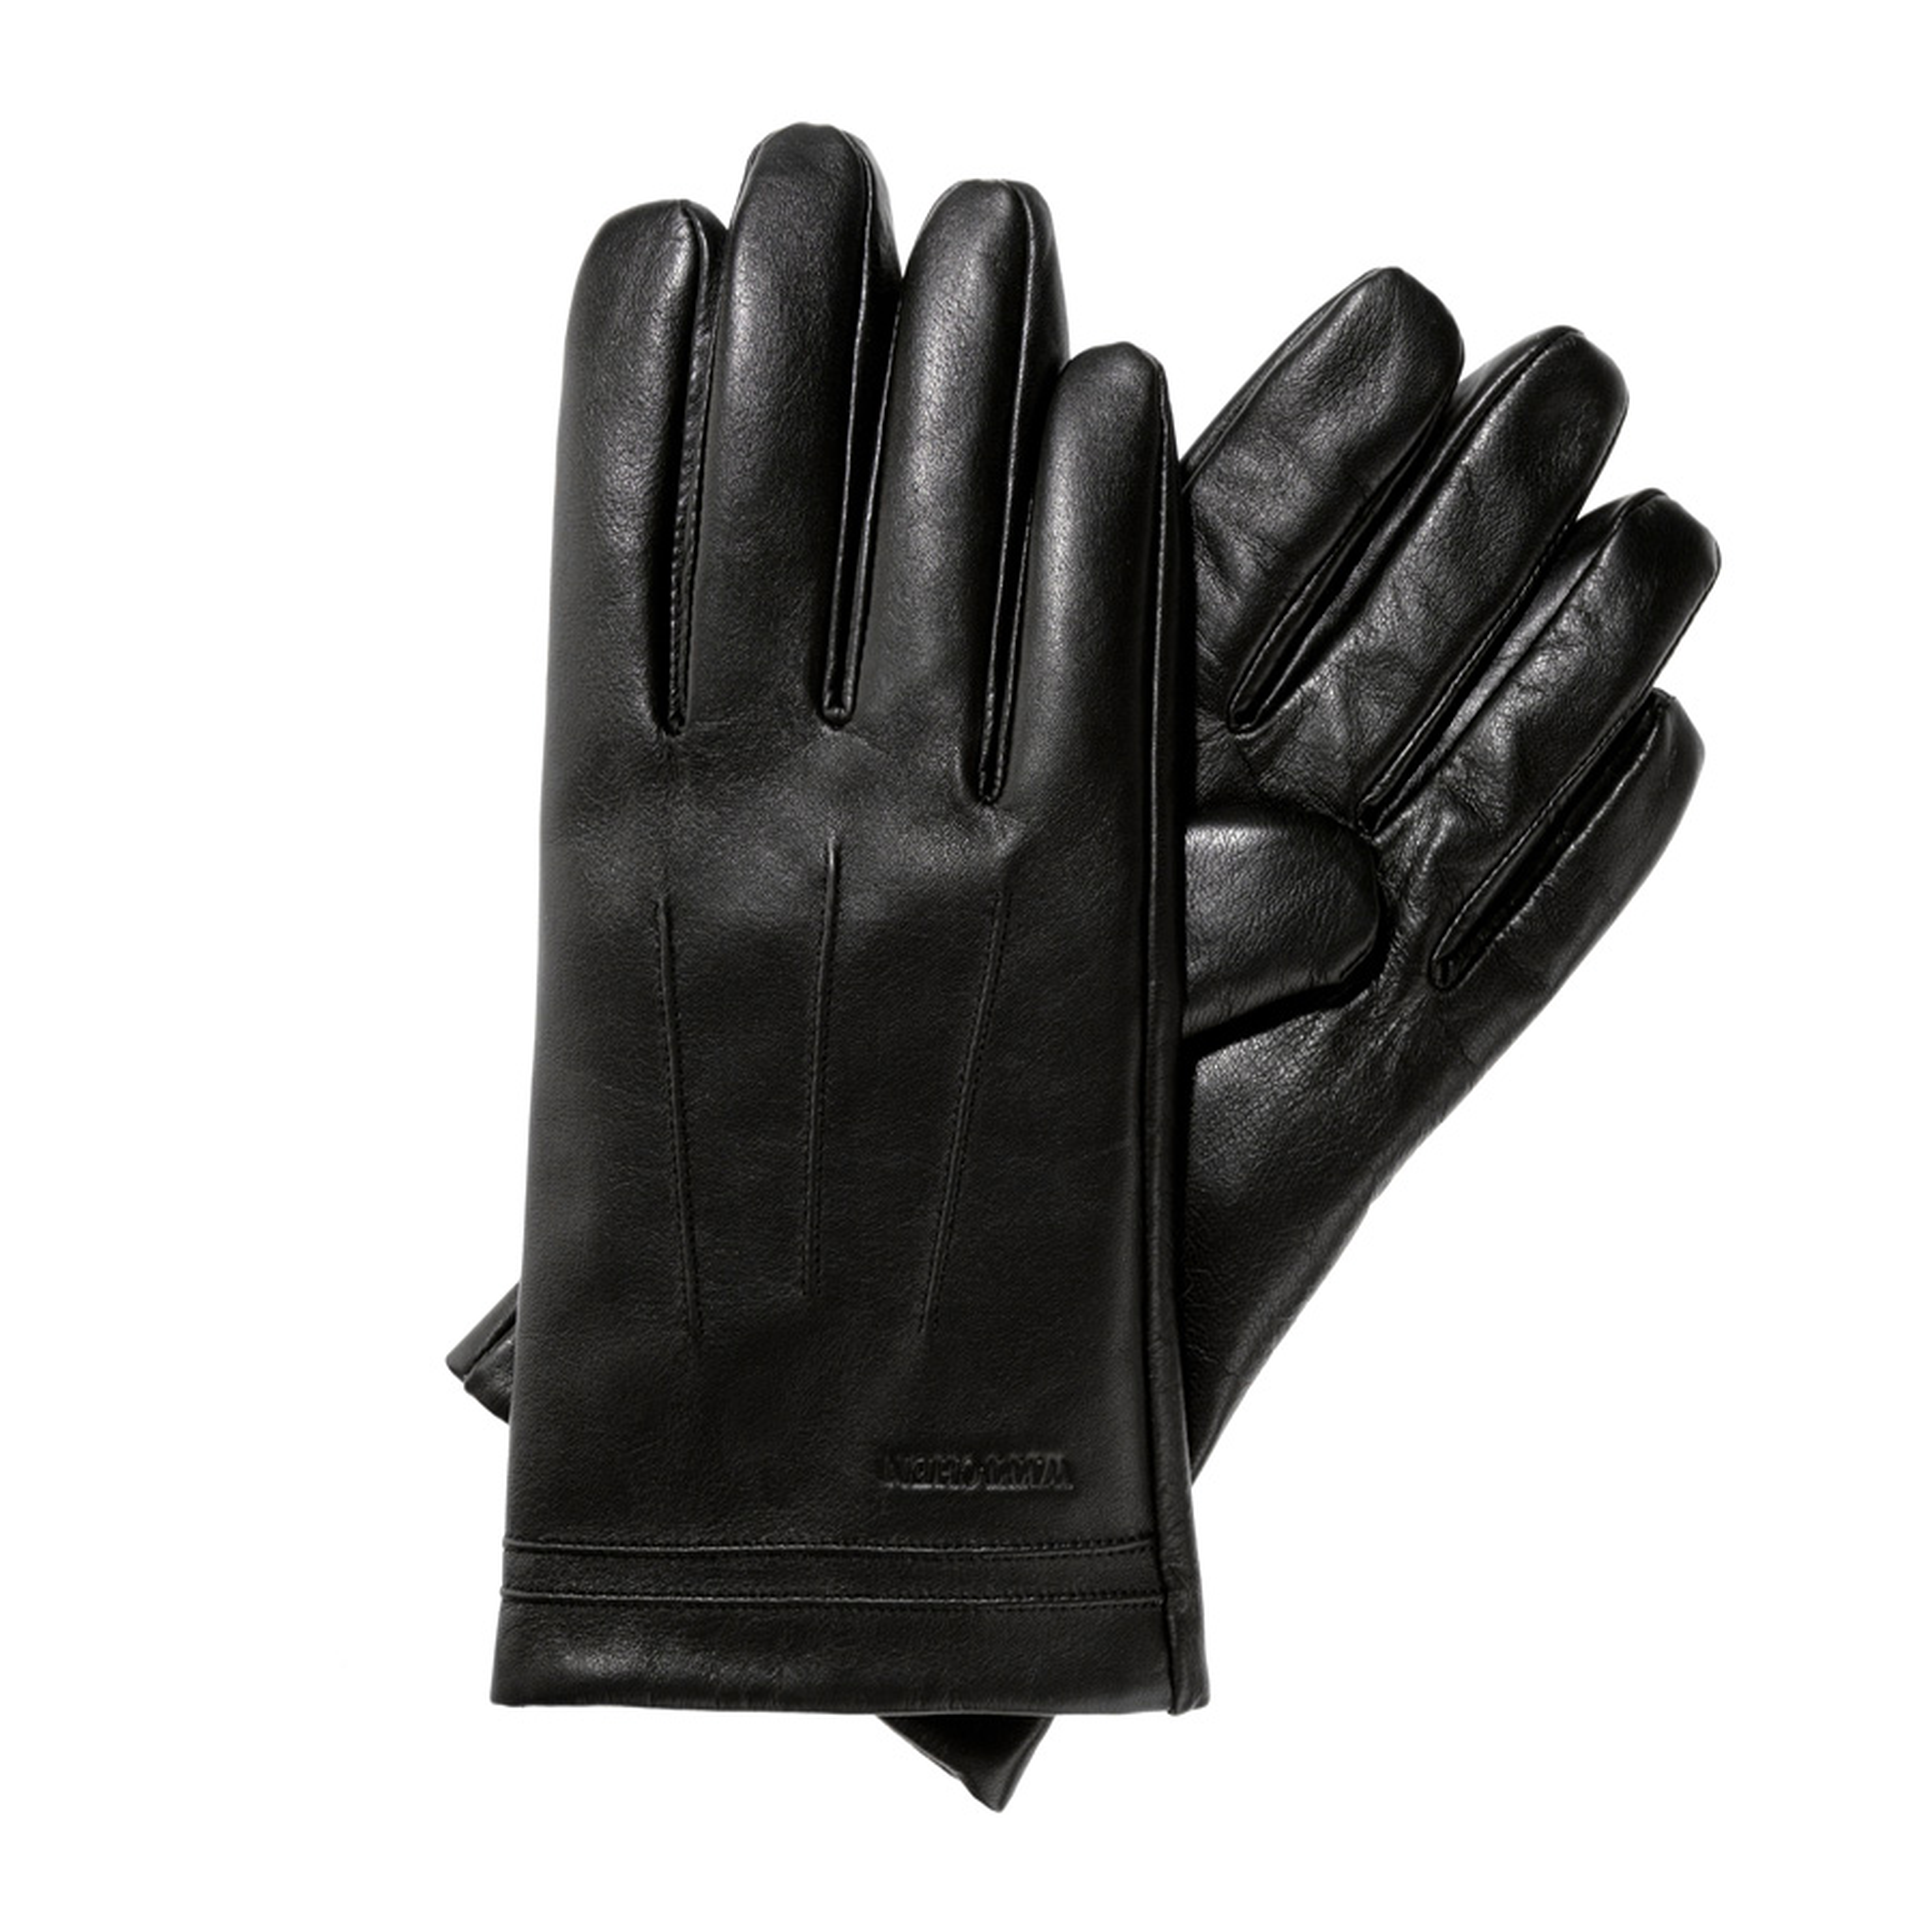 Перчатки мужские кожаныеПерчатки мужские кожаные<br><br>секс: мужчина<br>Цвет: черный<br>Размер INT: M